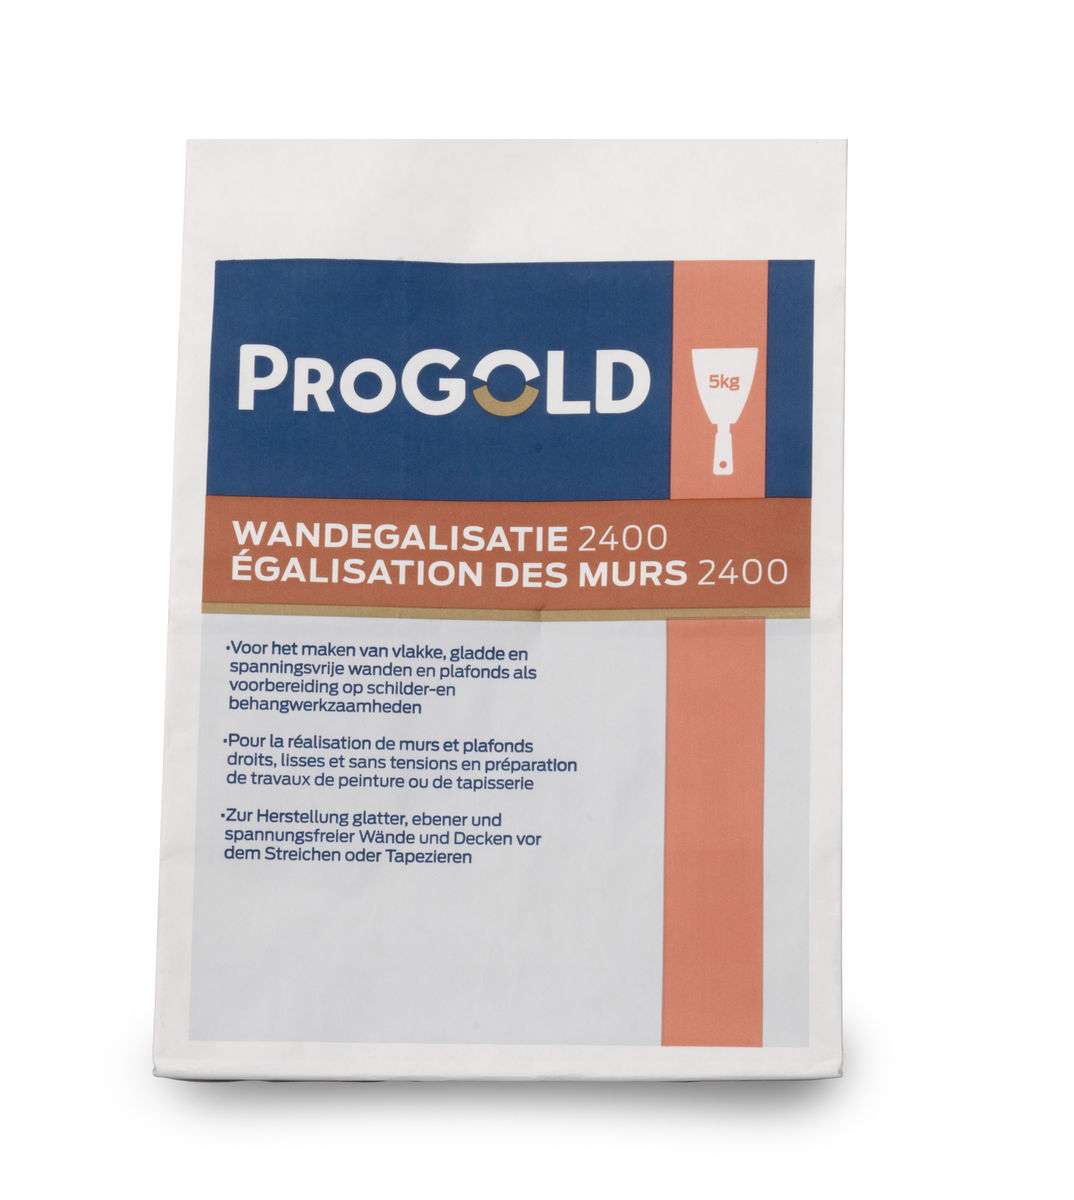 ProGold 2400 Wandegalisatie